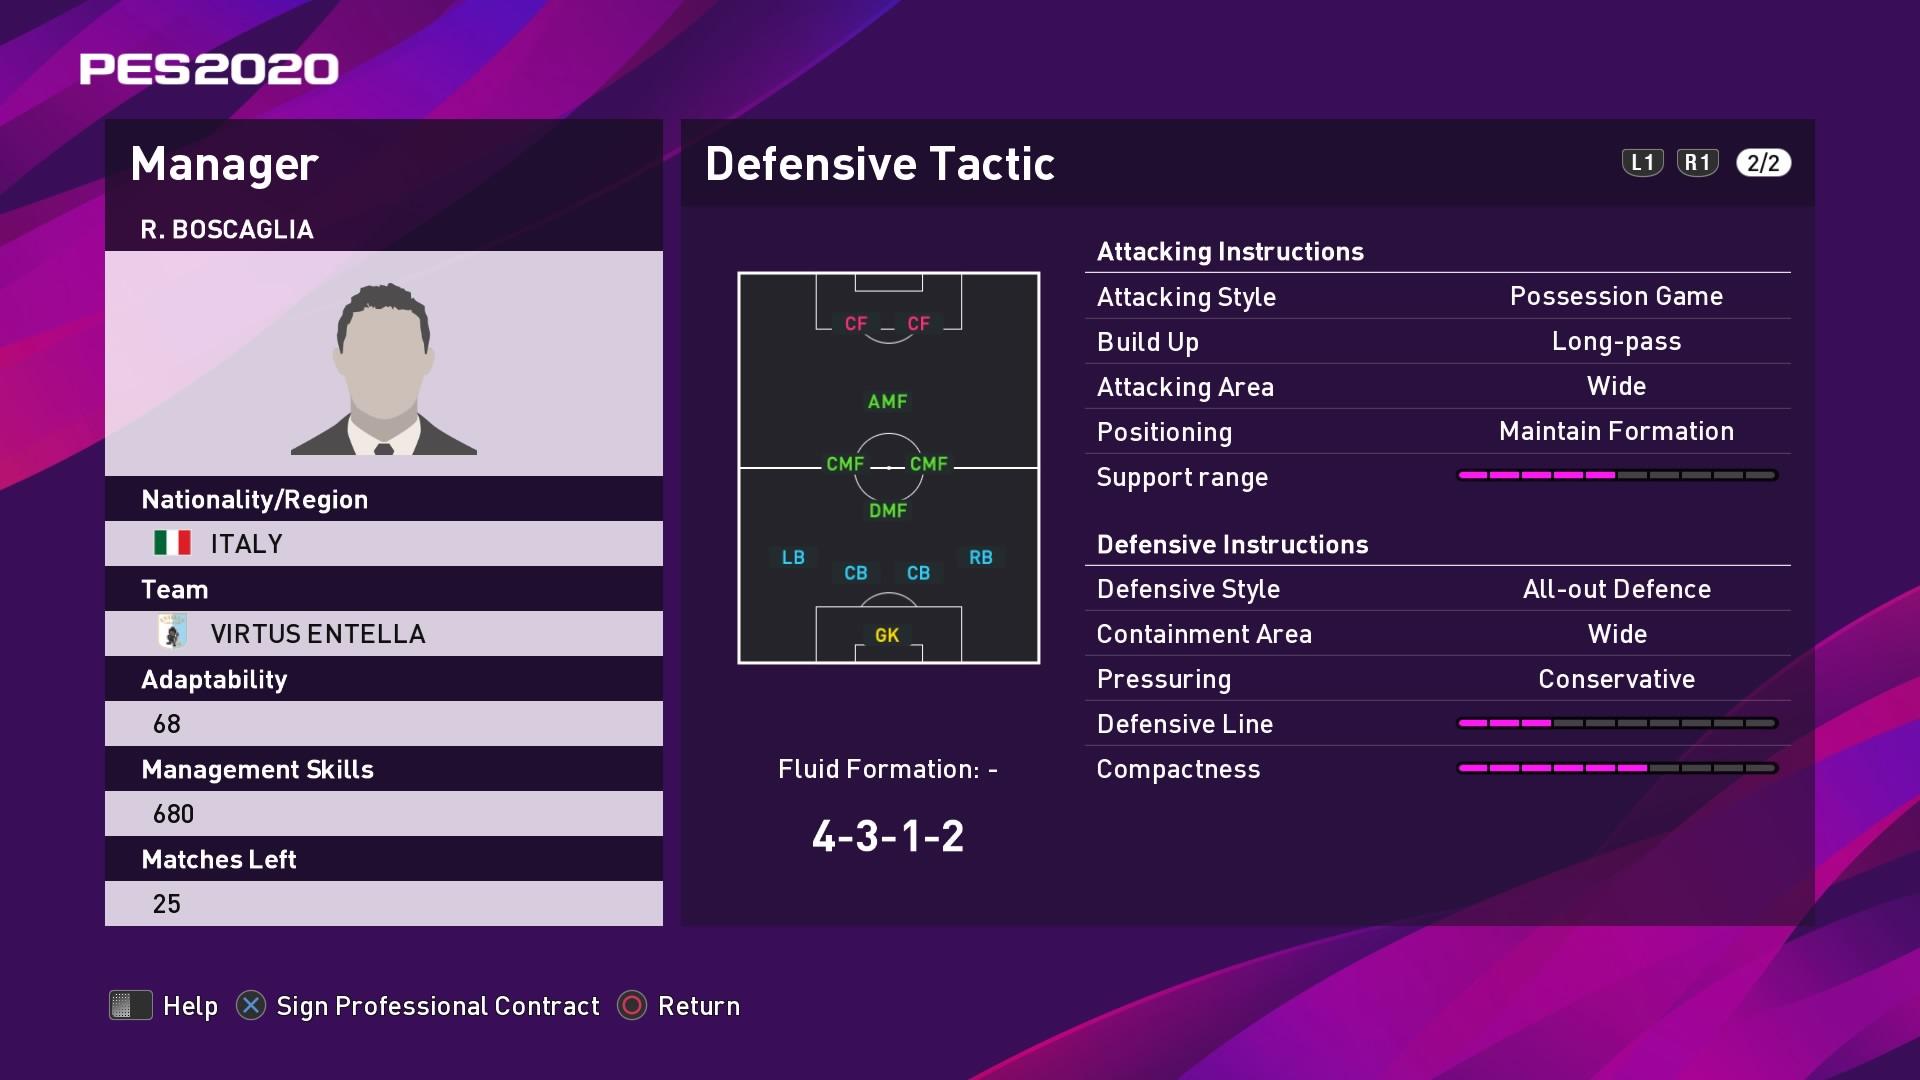 R. Boscaglia (Roberto Boscaglia) Defensive Tactic in PES 2020 myClub